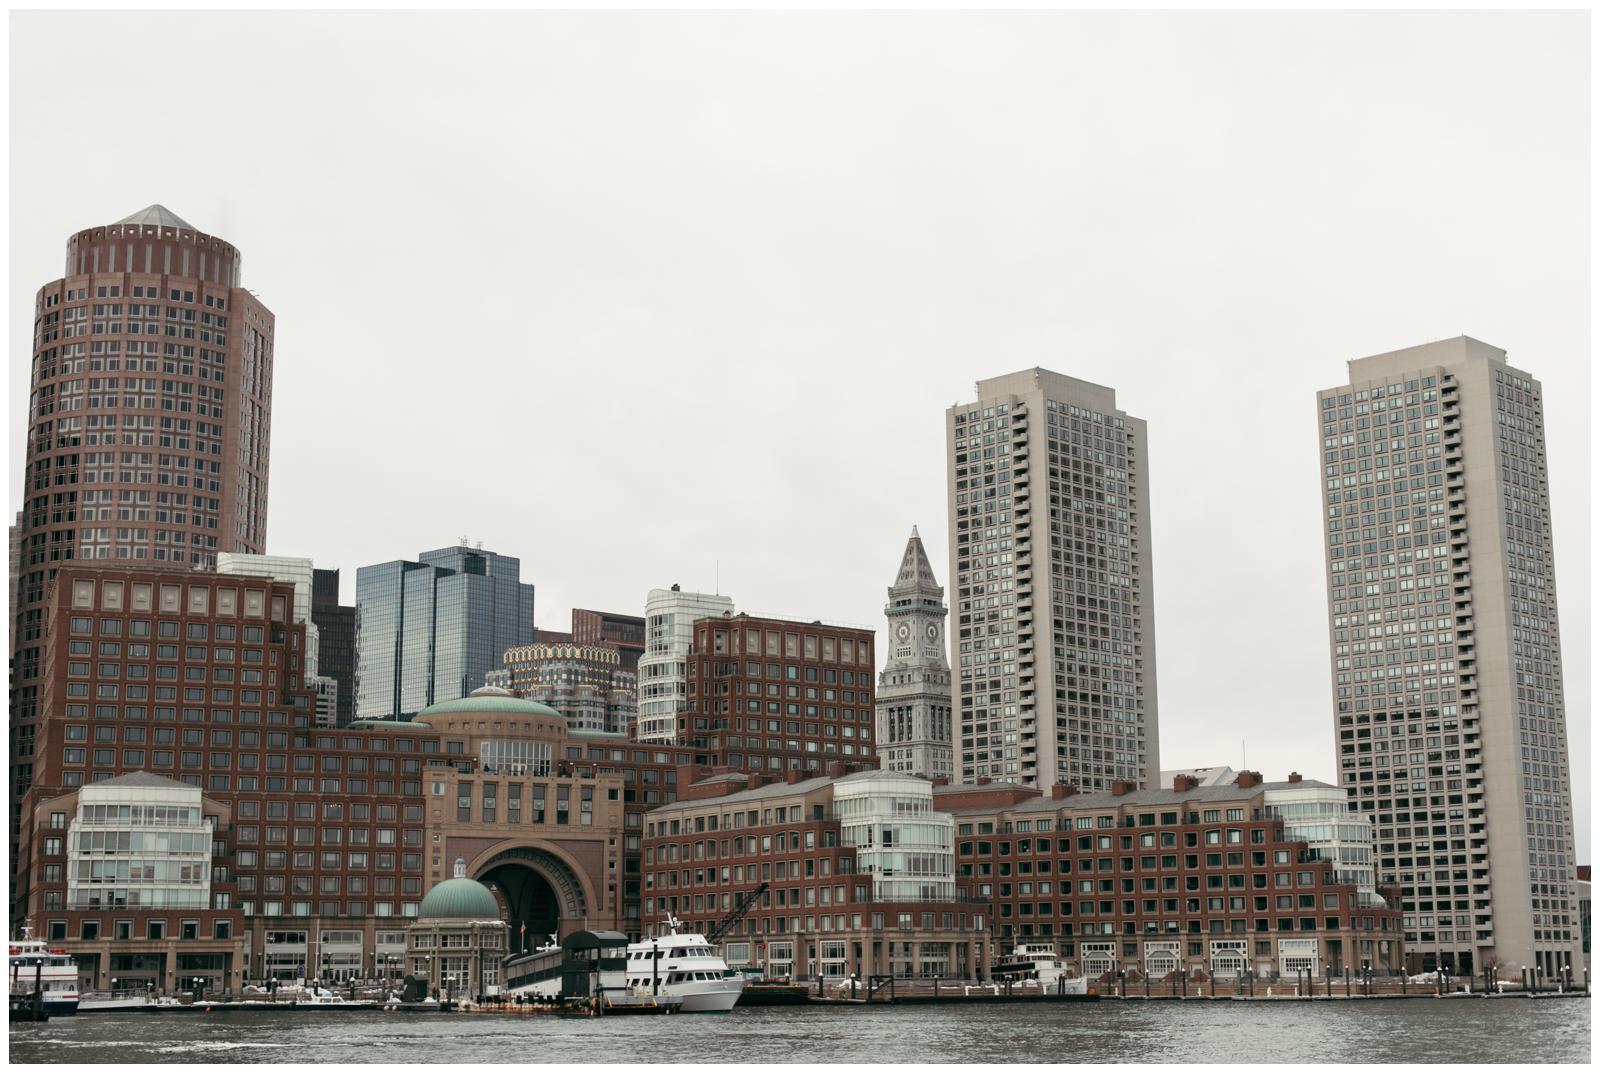 Boston Seaport skyline